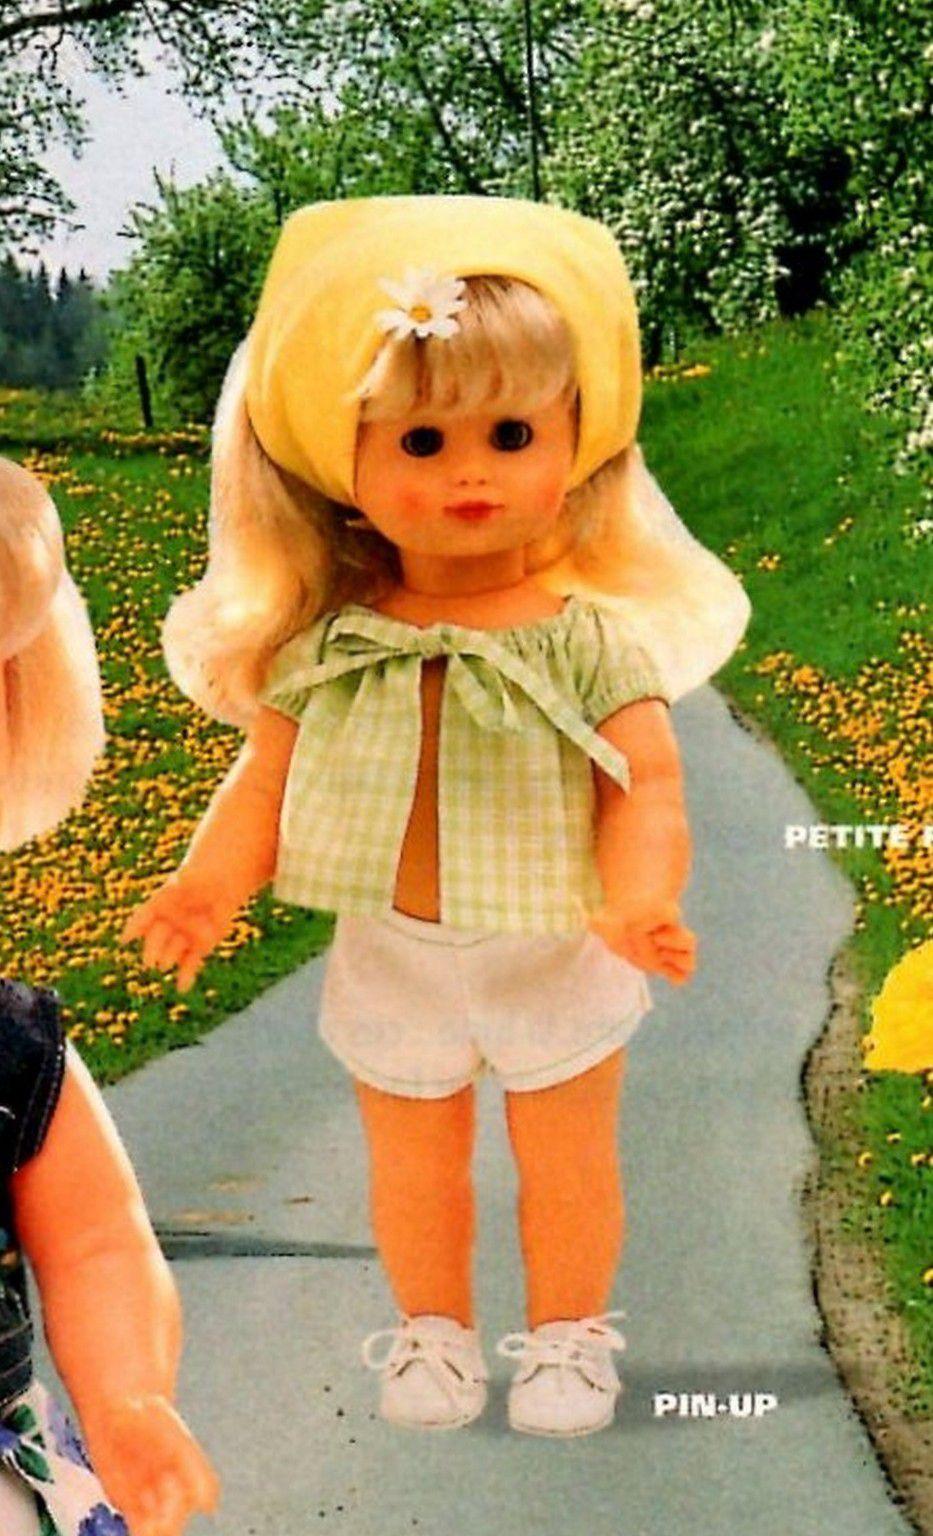 Emilie-Juliette en Pin-Up juillet 2000